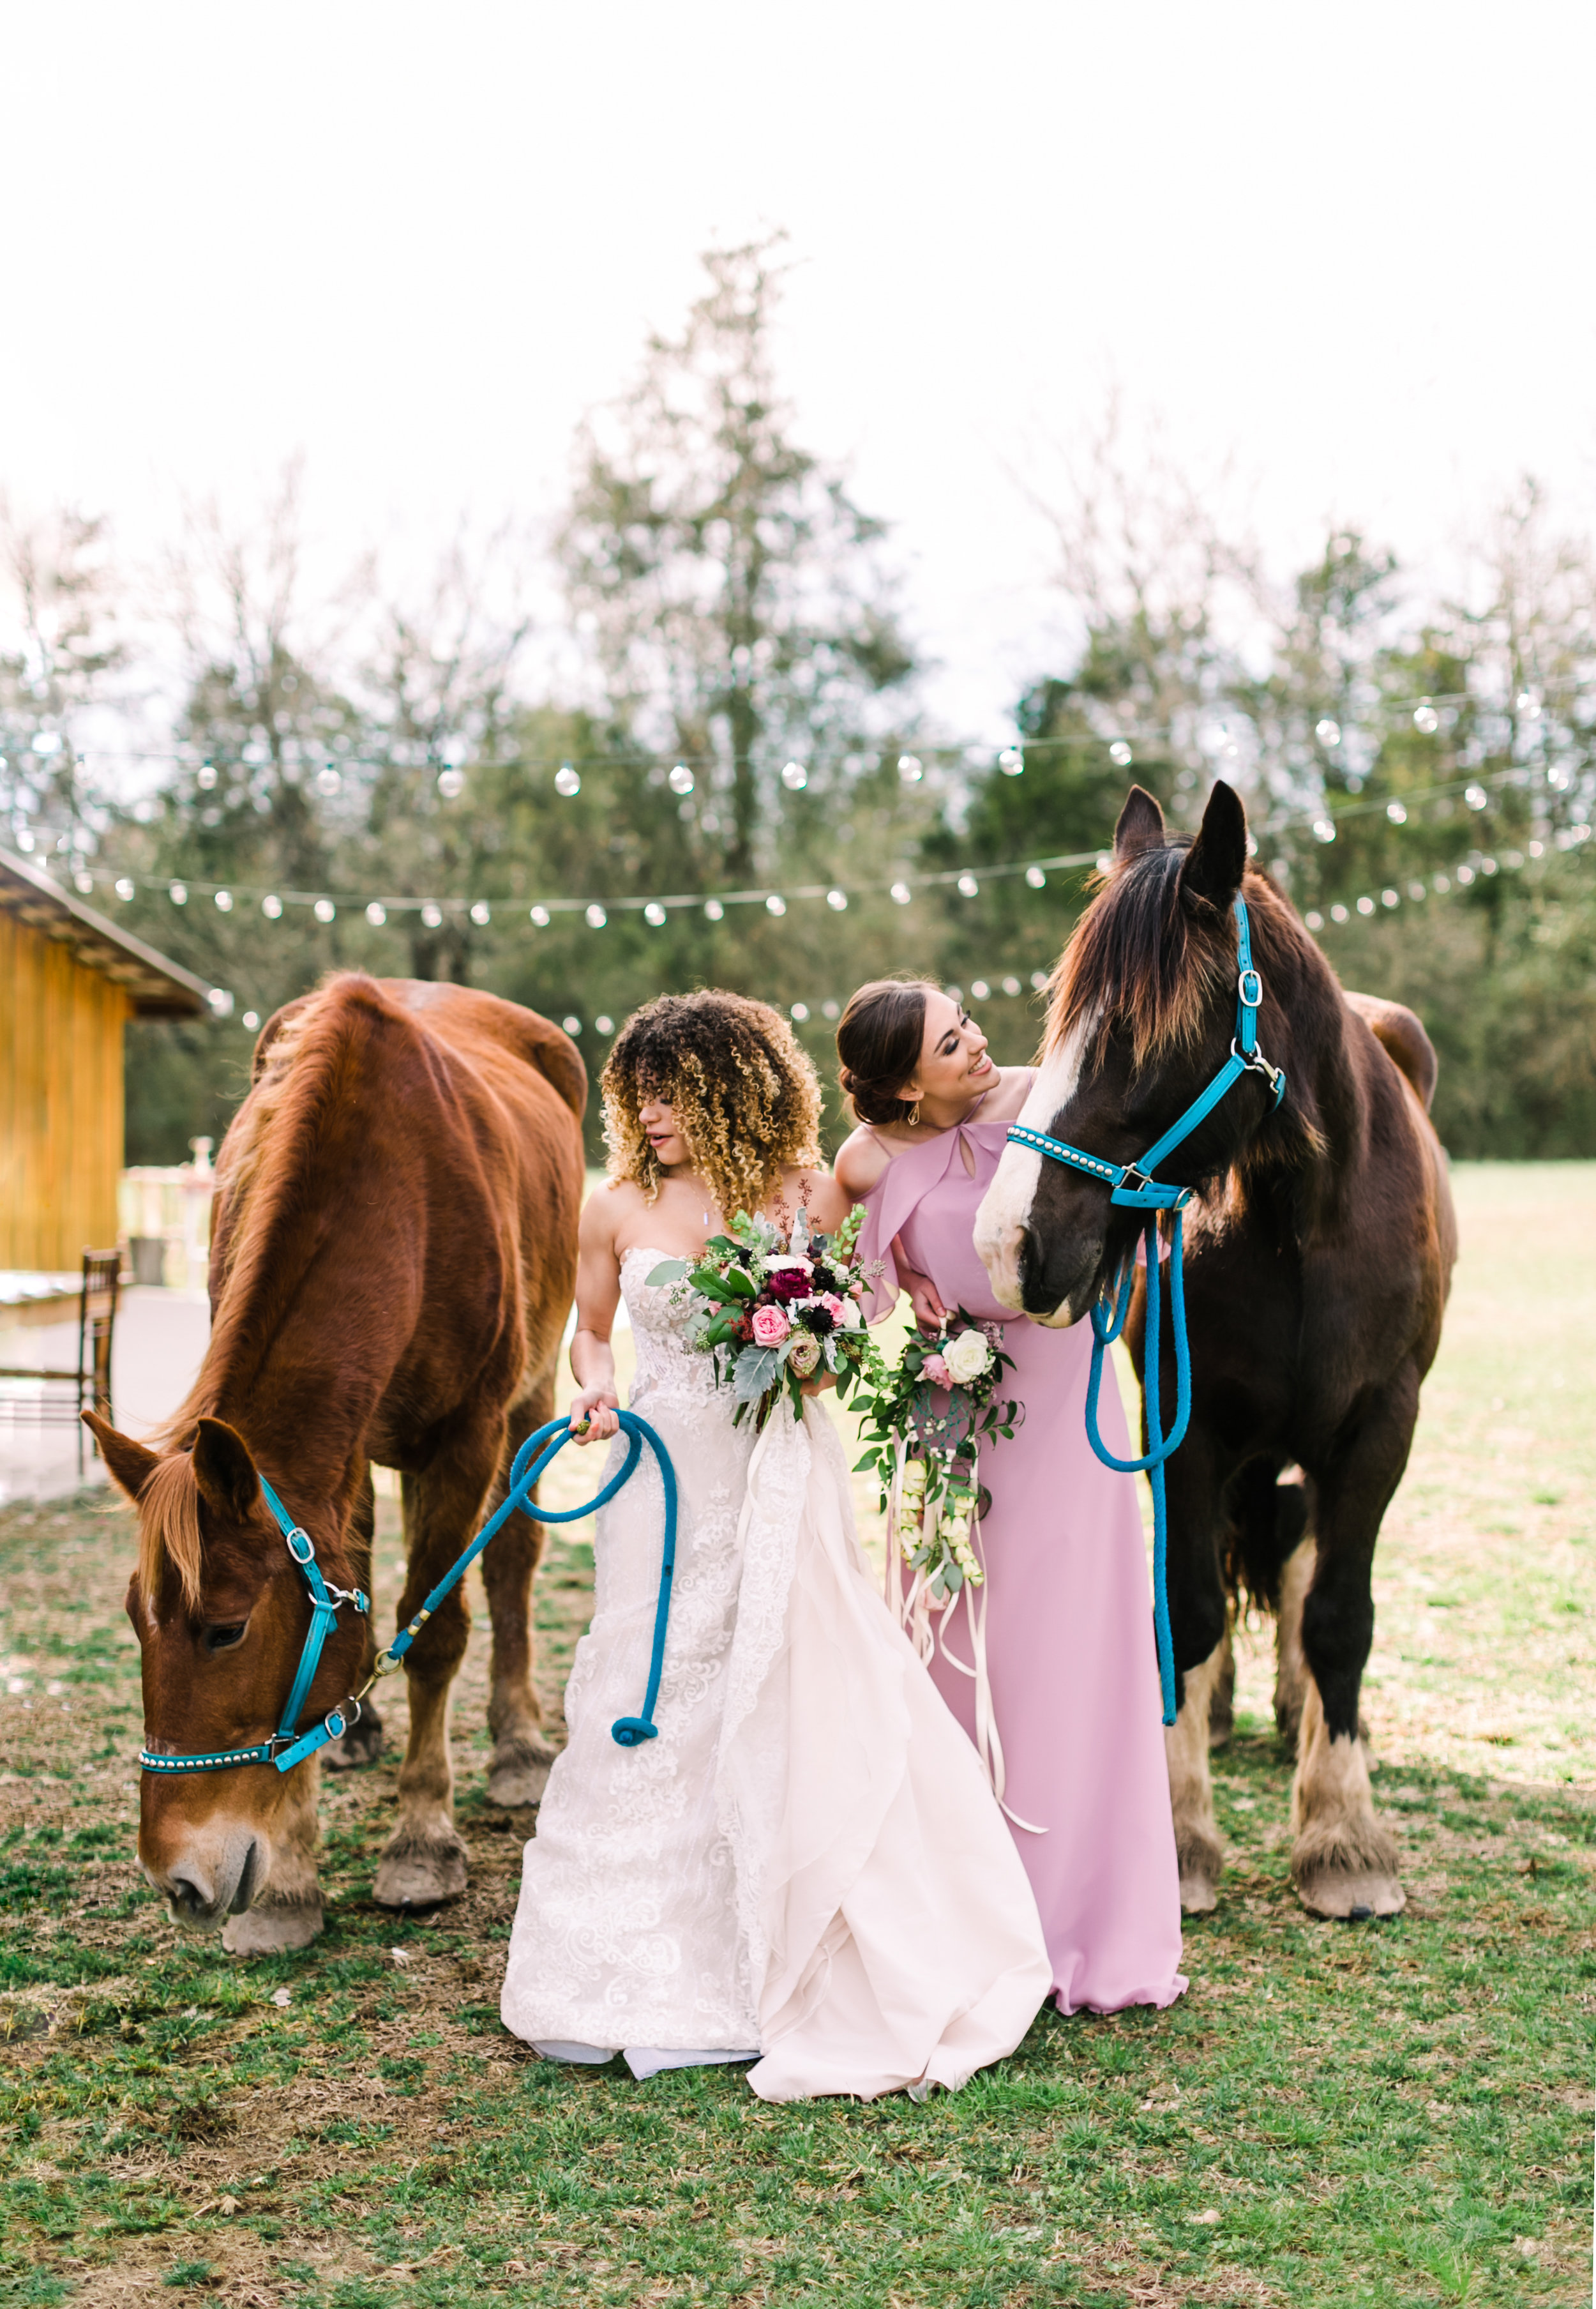 romantic+valentines+day+wedding+horses+chapel (8 of 11).jpg